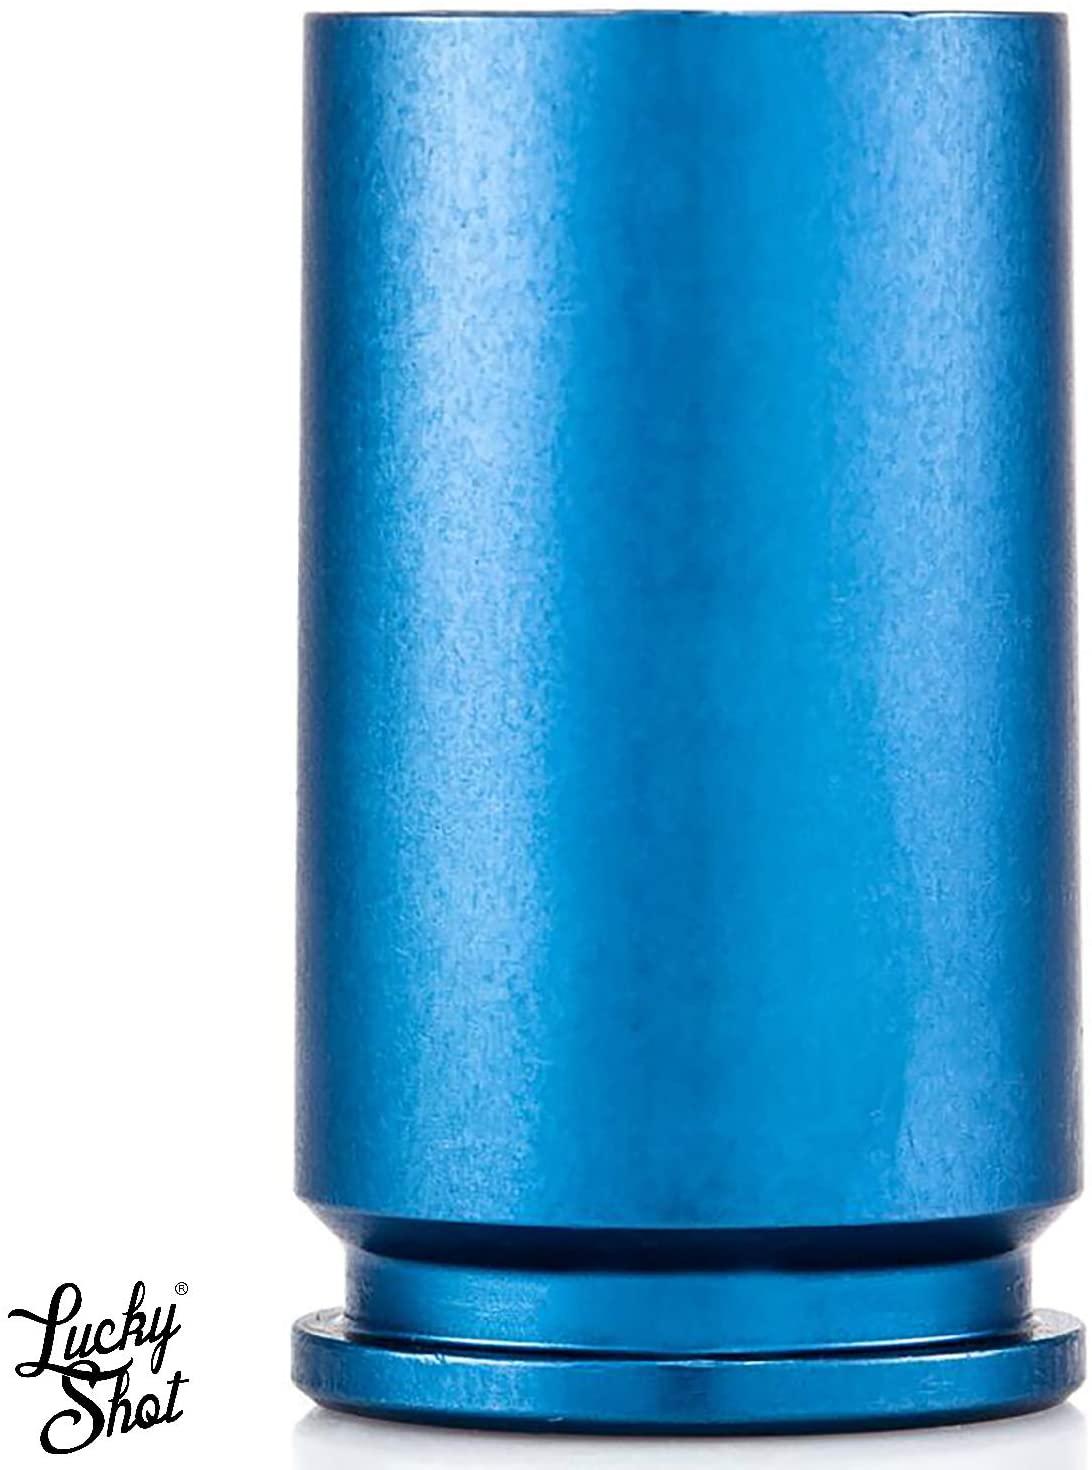 Lucky Shot USA 30 MM A-10 Shot Glass | Warthog Shell Casing | Made in America | 2.7 oz Blue